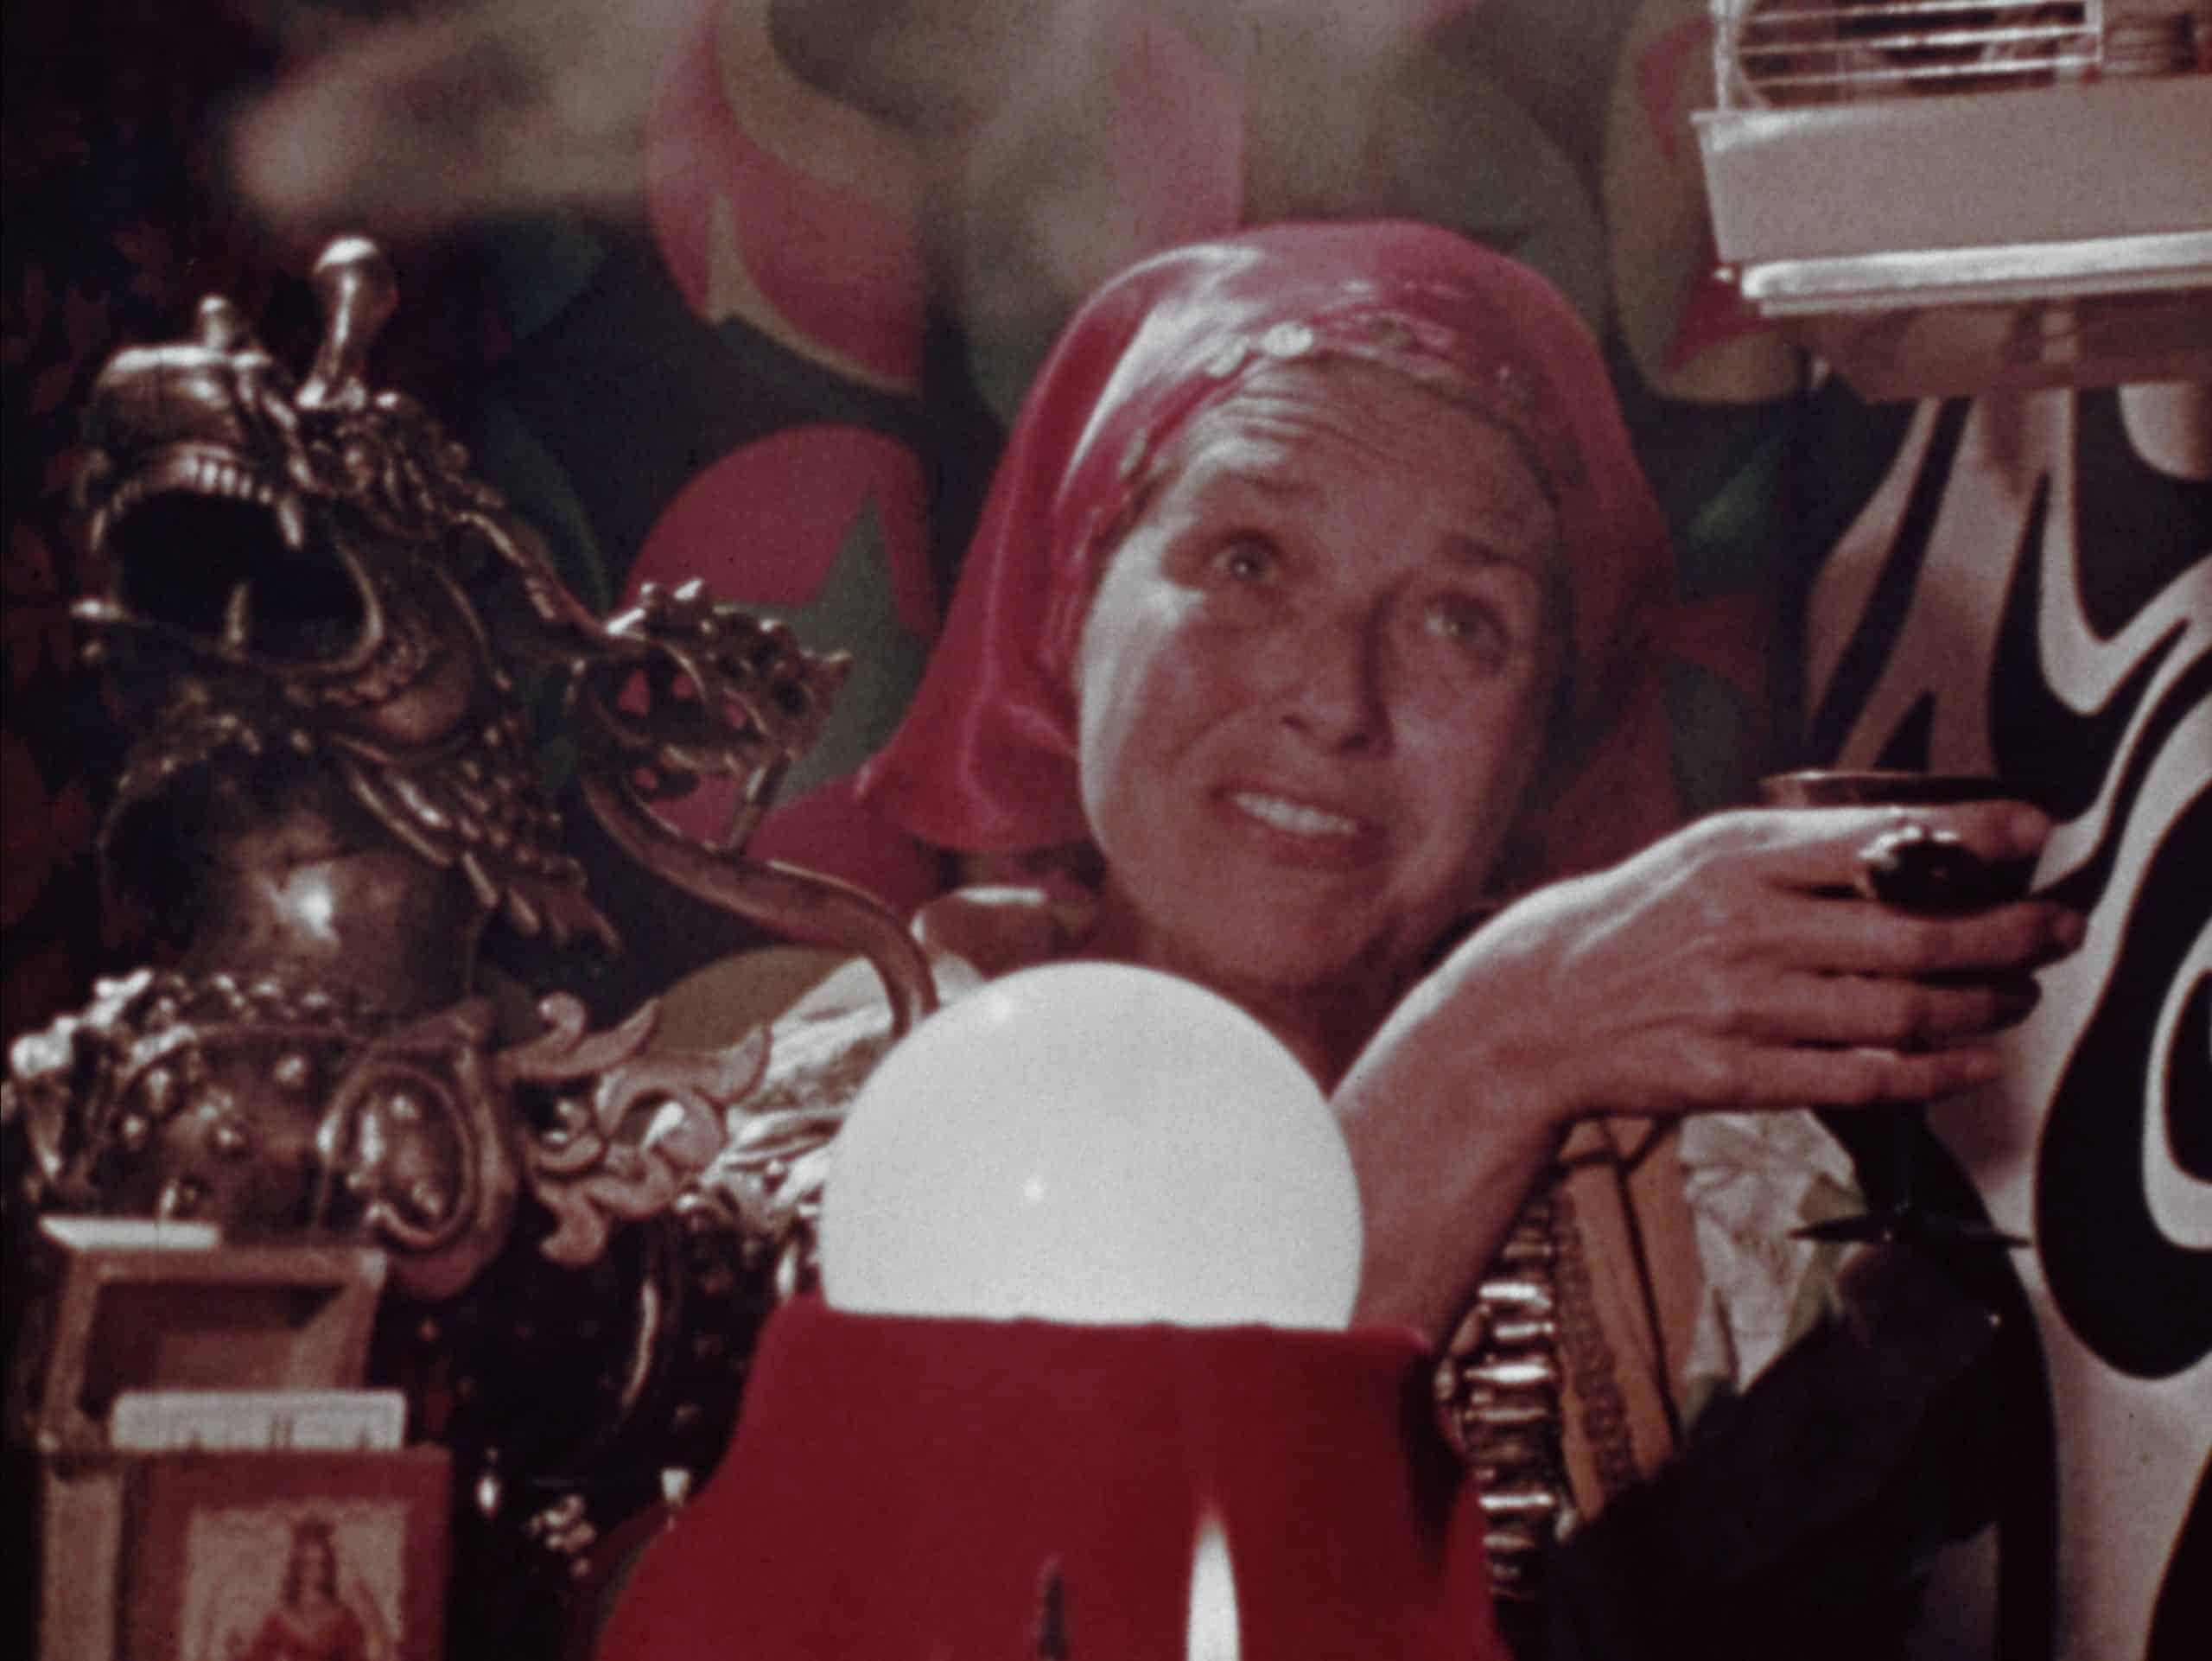 George Romero's lost film The Amusement Park returns via Shudder (2021) 6